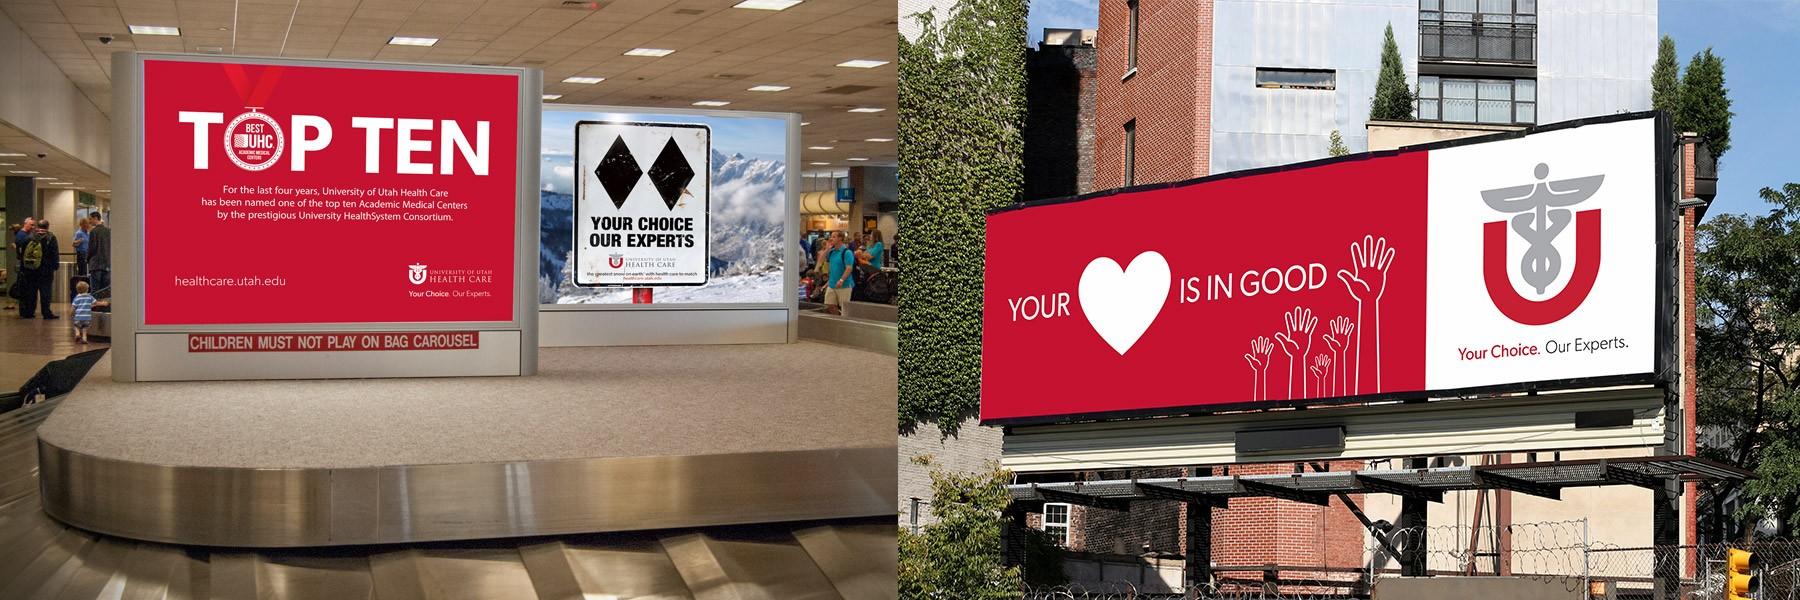 Photos of University of Utah Healthcare signs and billboard